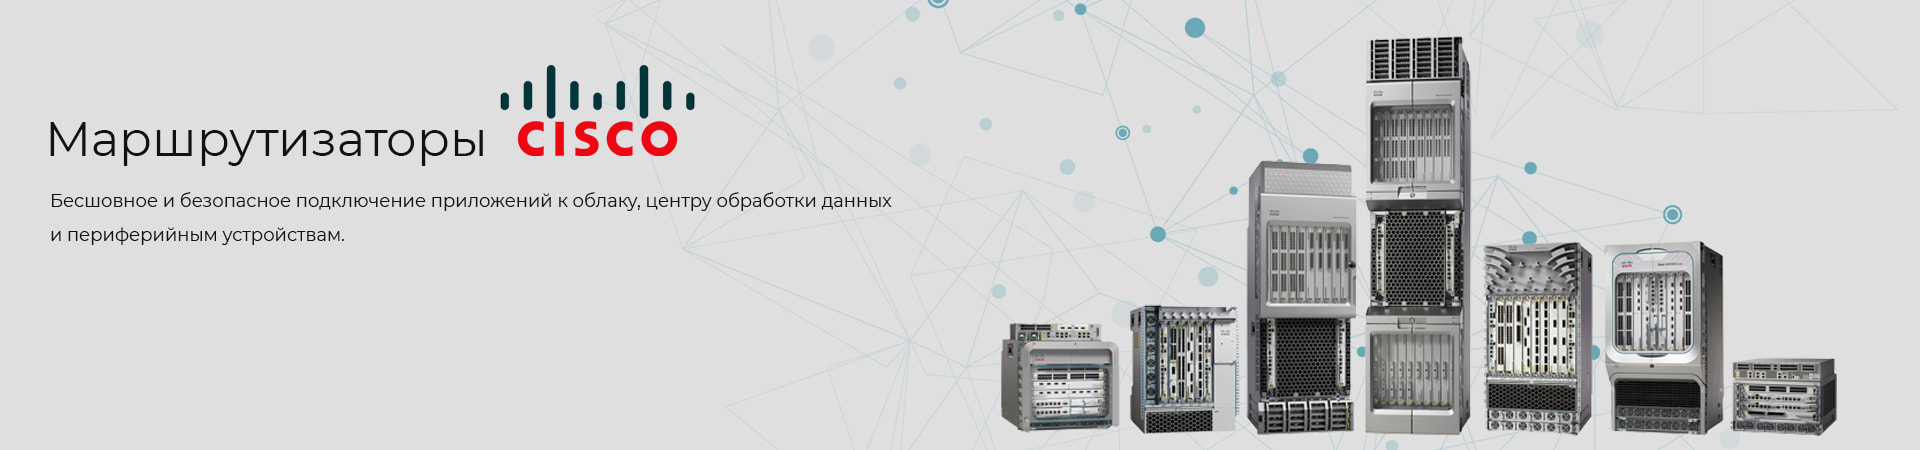 Маршрутизаторы-Cisco-в-Минске